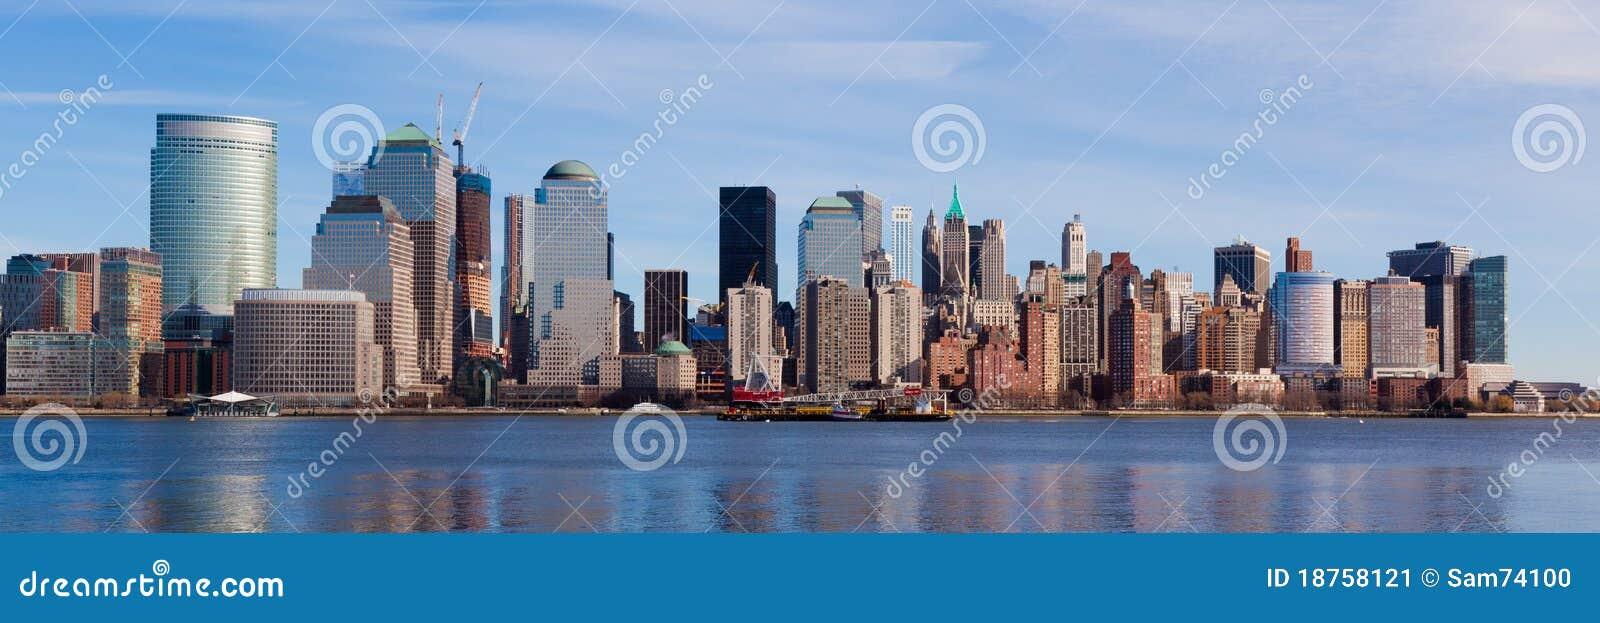 new york skyline view - photo #29